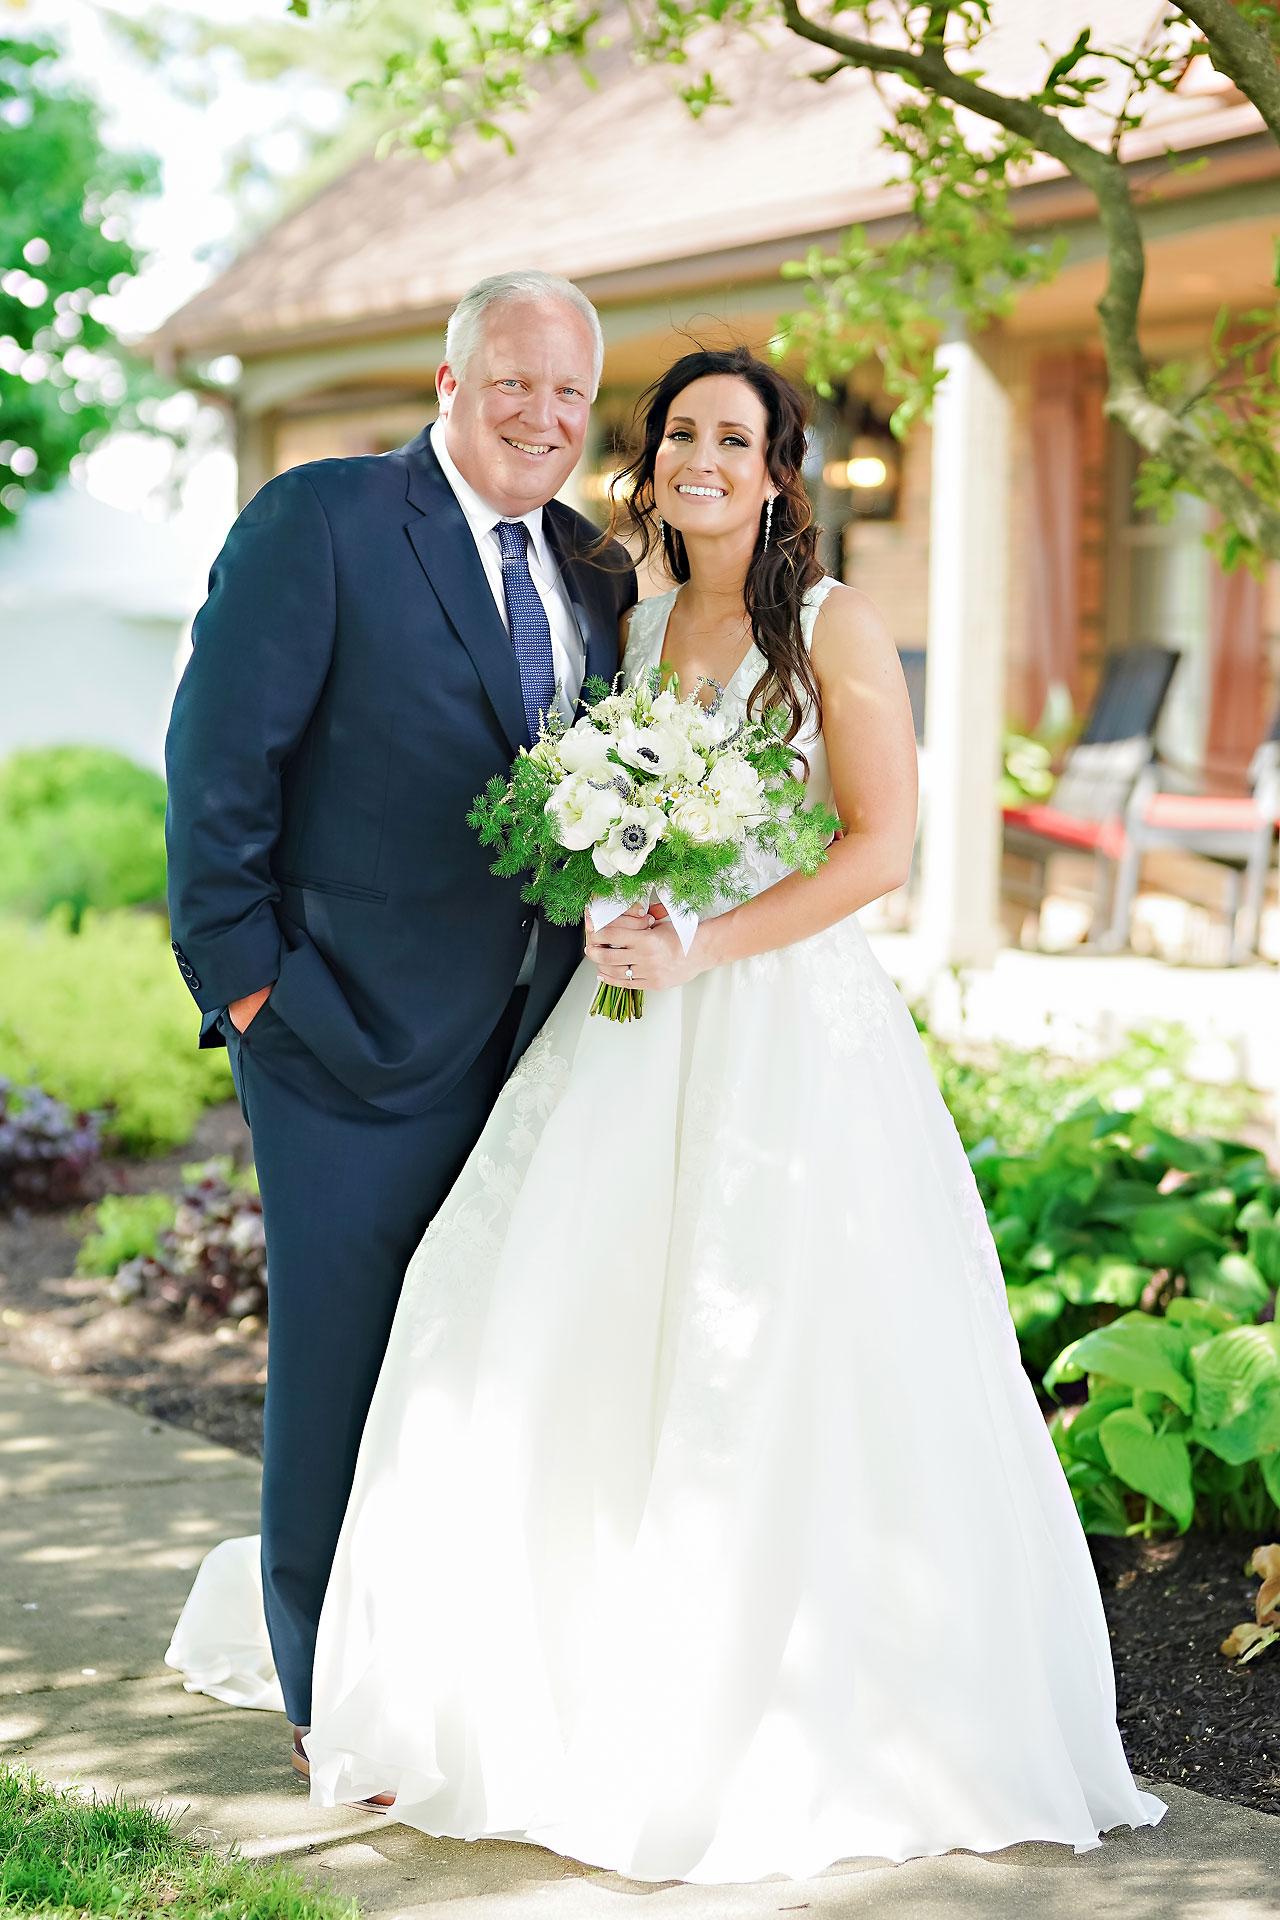 MacKinze John Lafayette Indiana Purdue Wedding 134